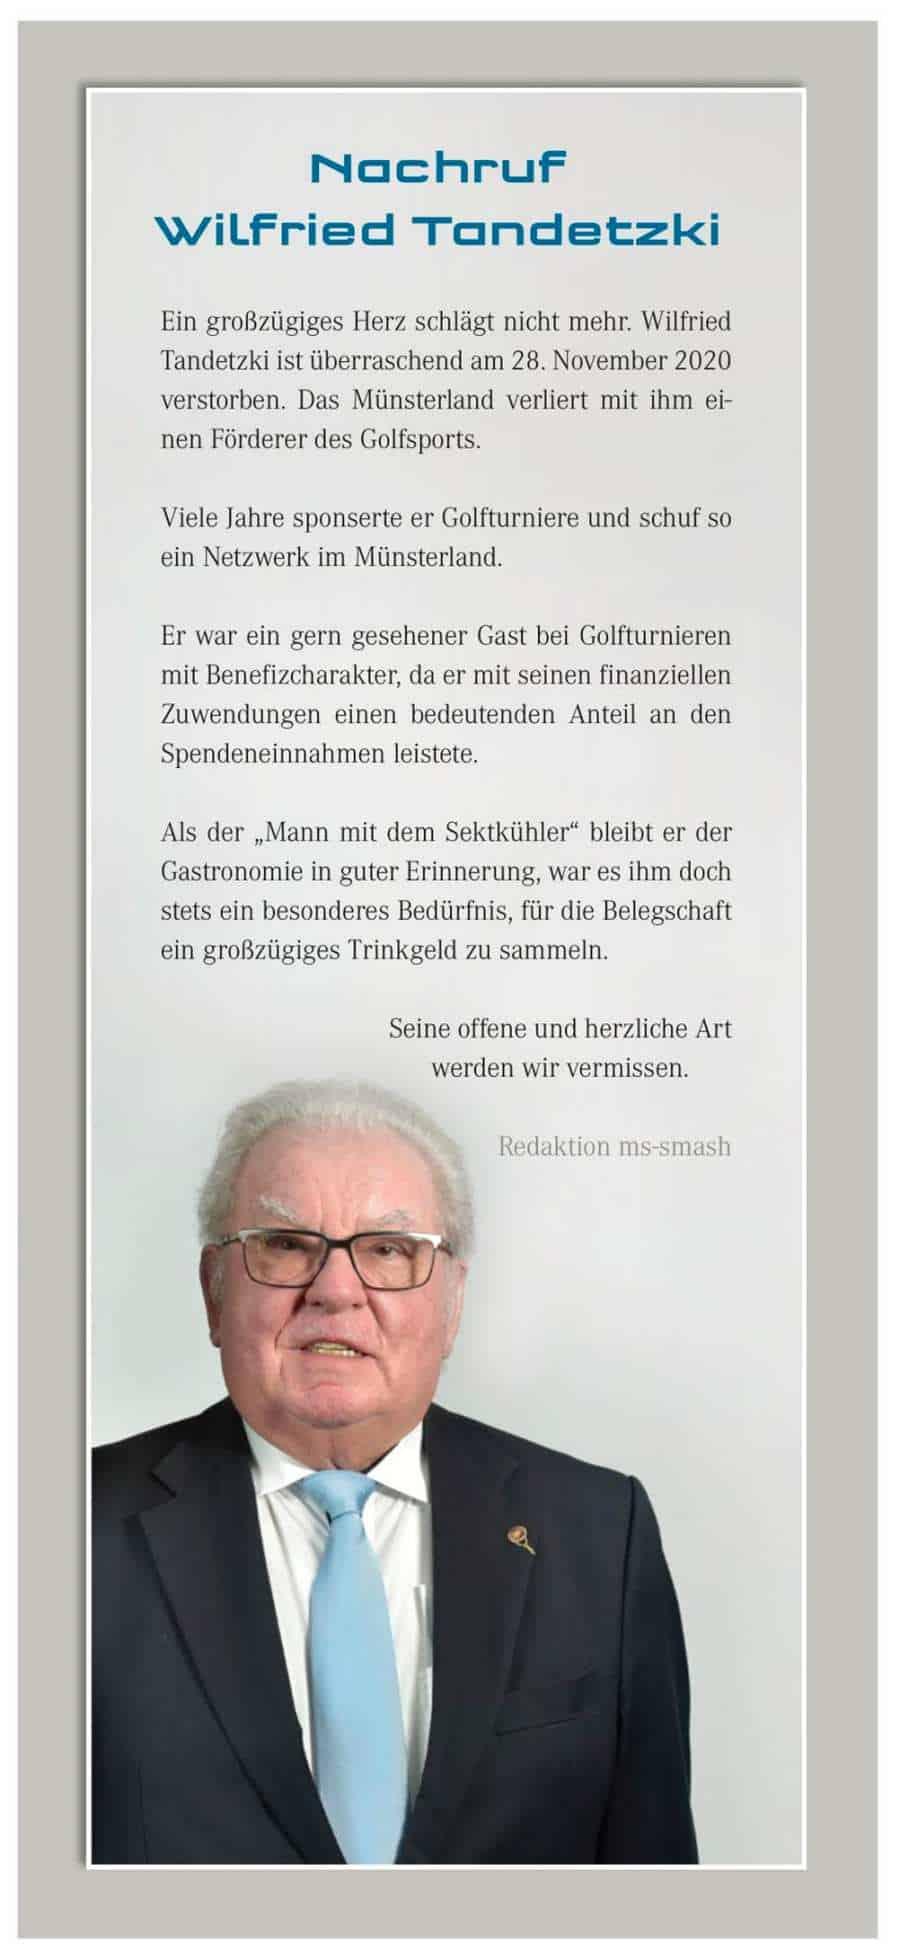 Nachruf Wilfried Tandetzki